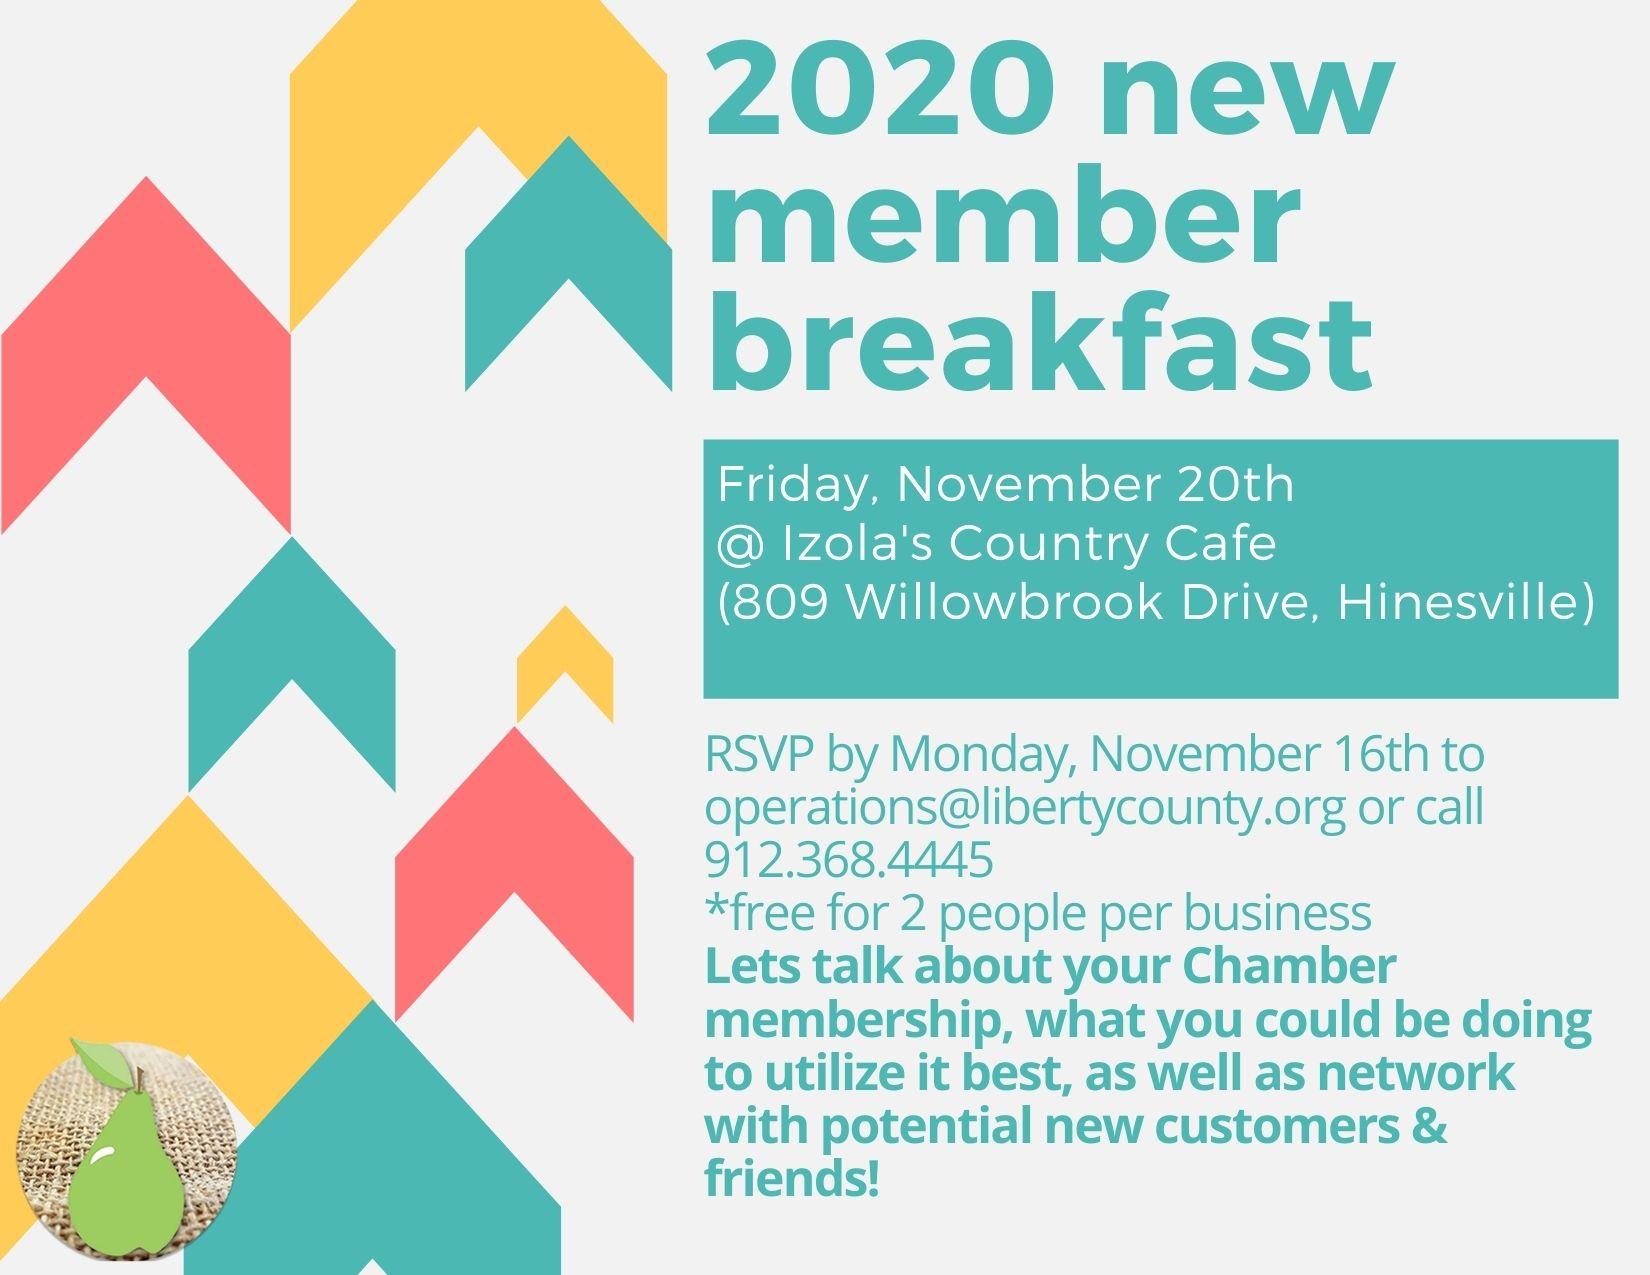 2020 New Membership Breakfast